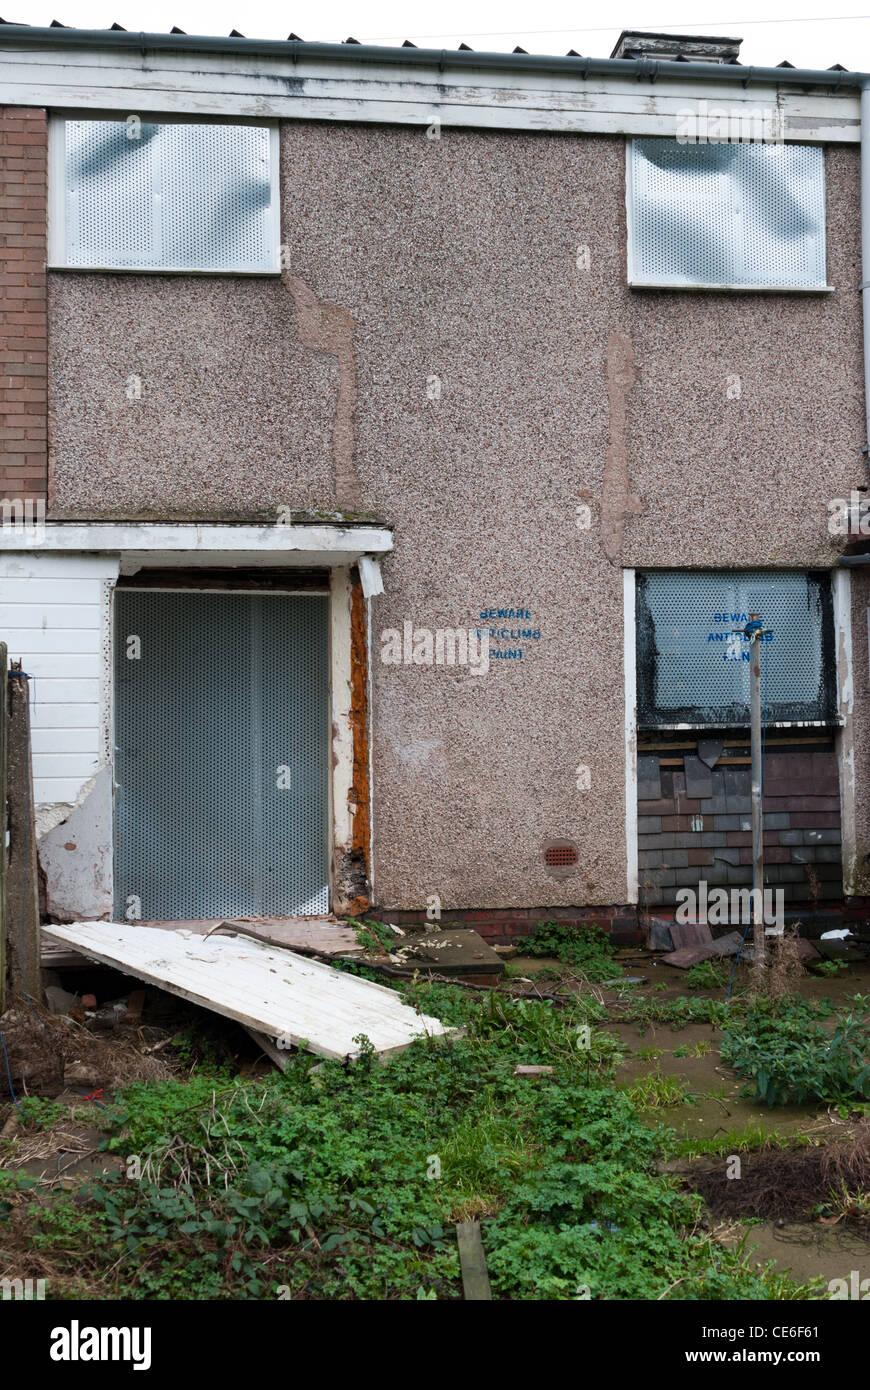 Demolition of a 1970's council estate in King's Norton, Birmingham Stock Photo